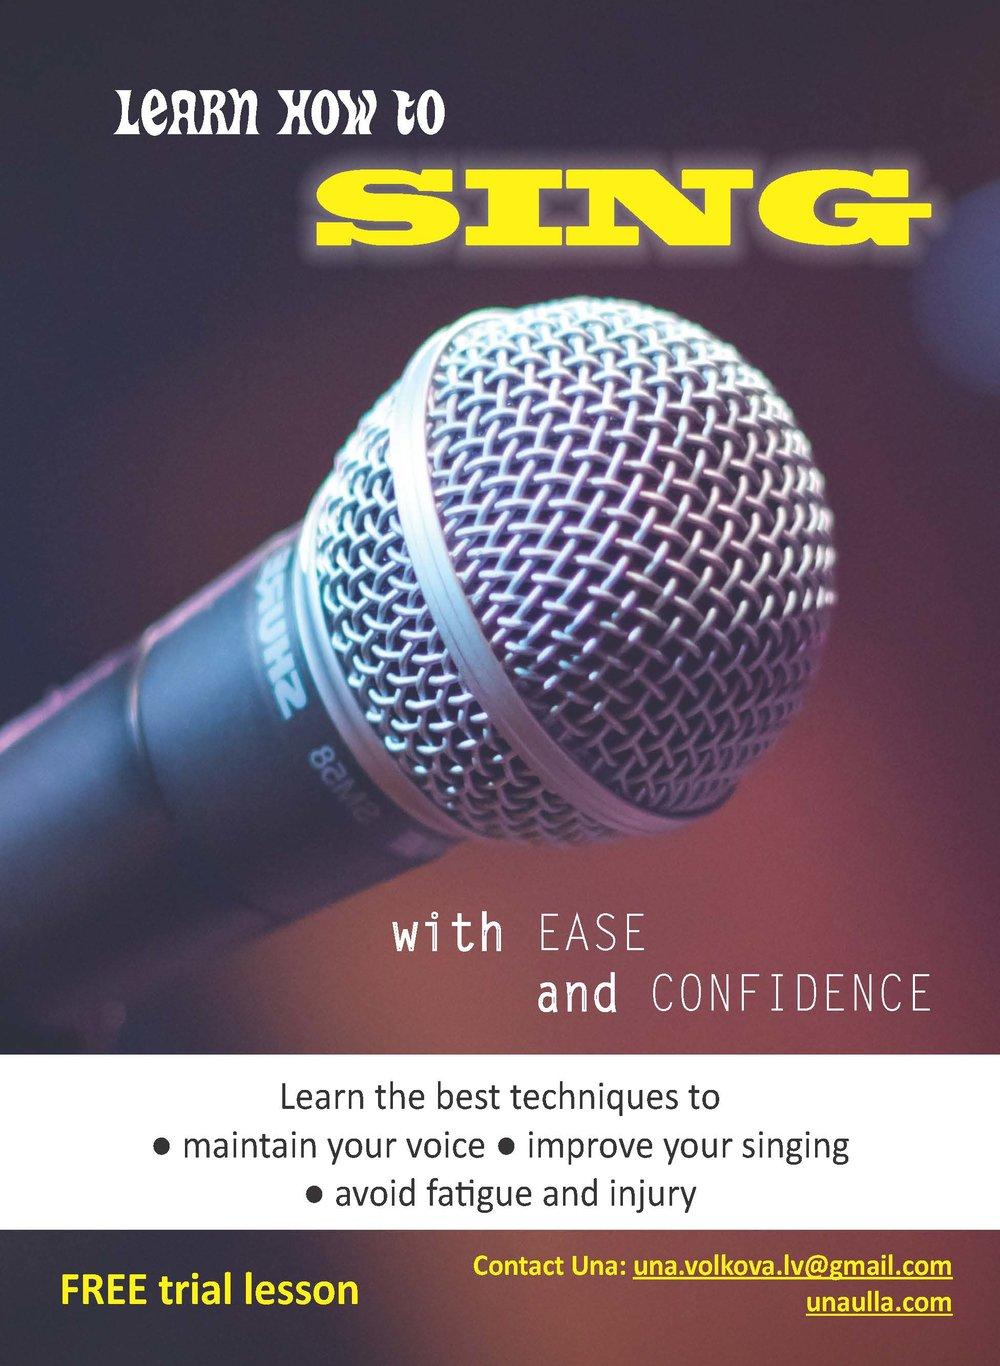 una singing poster.jpg